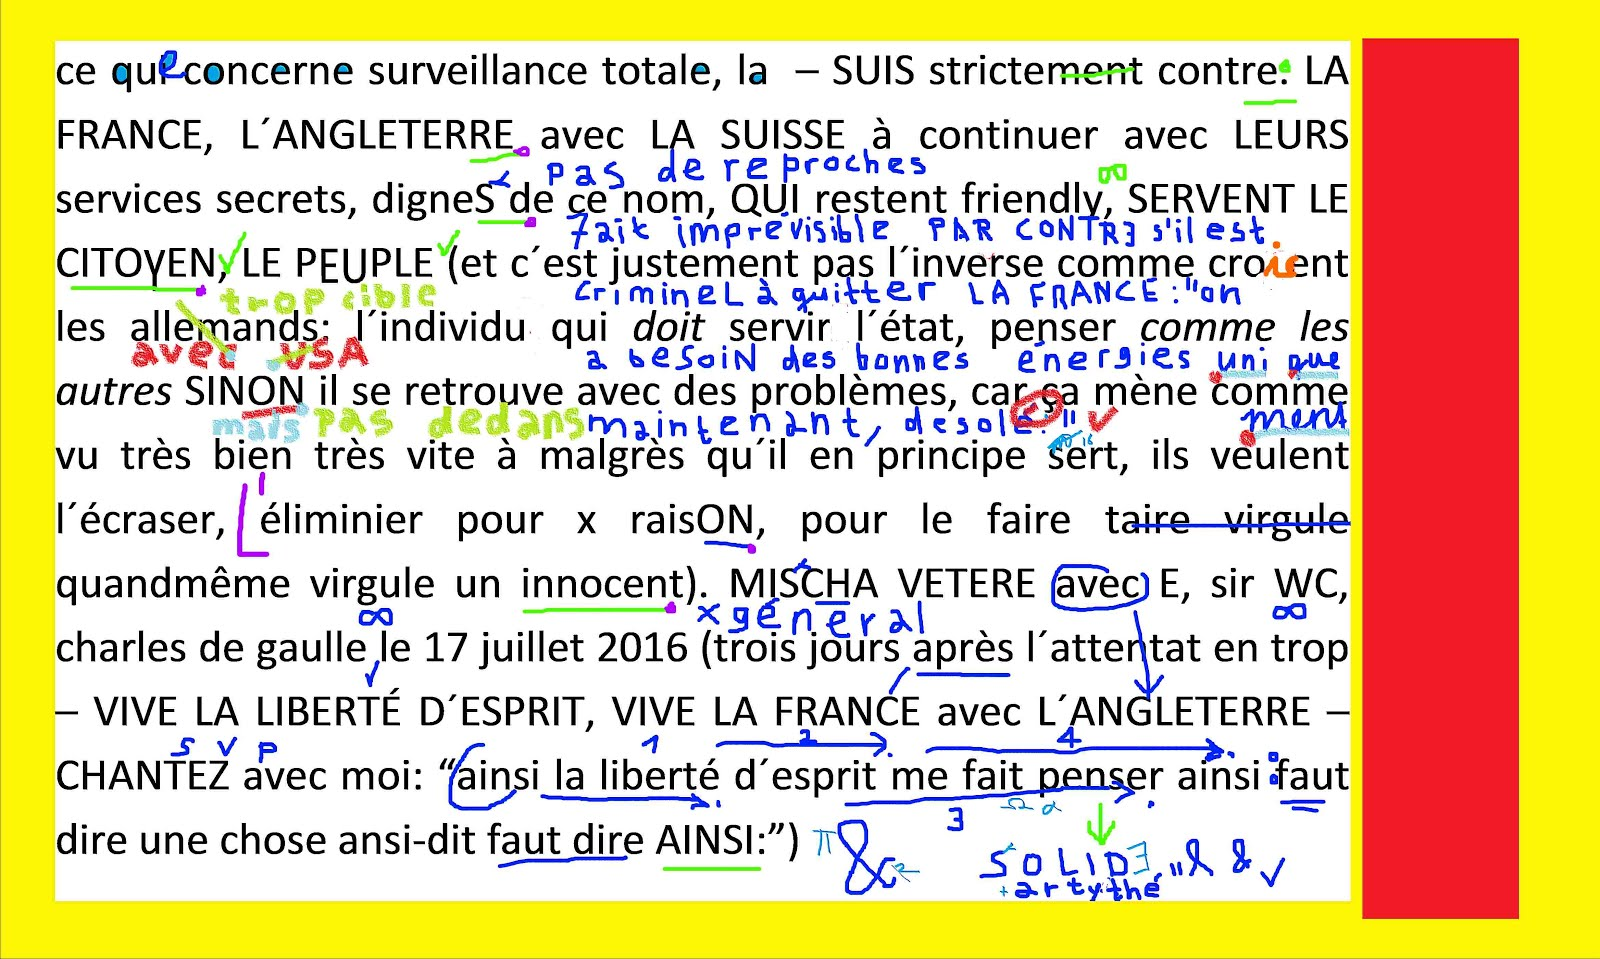 mischa vetere s´oppose strictement contre la surveillance totale en FRANCE, SUISSE , ANGLETERRE